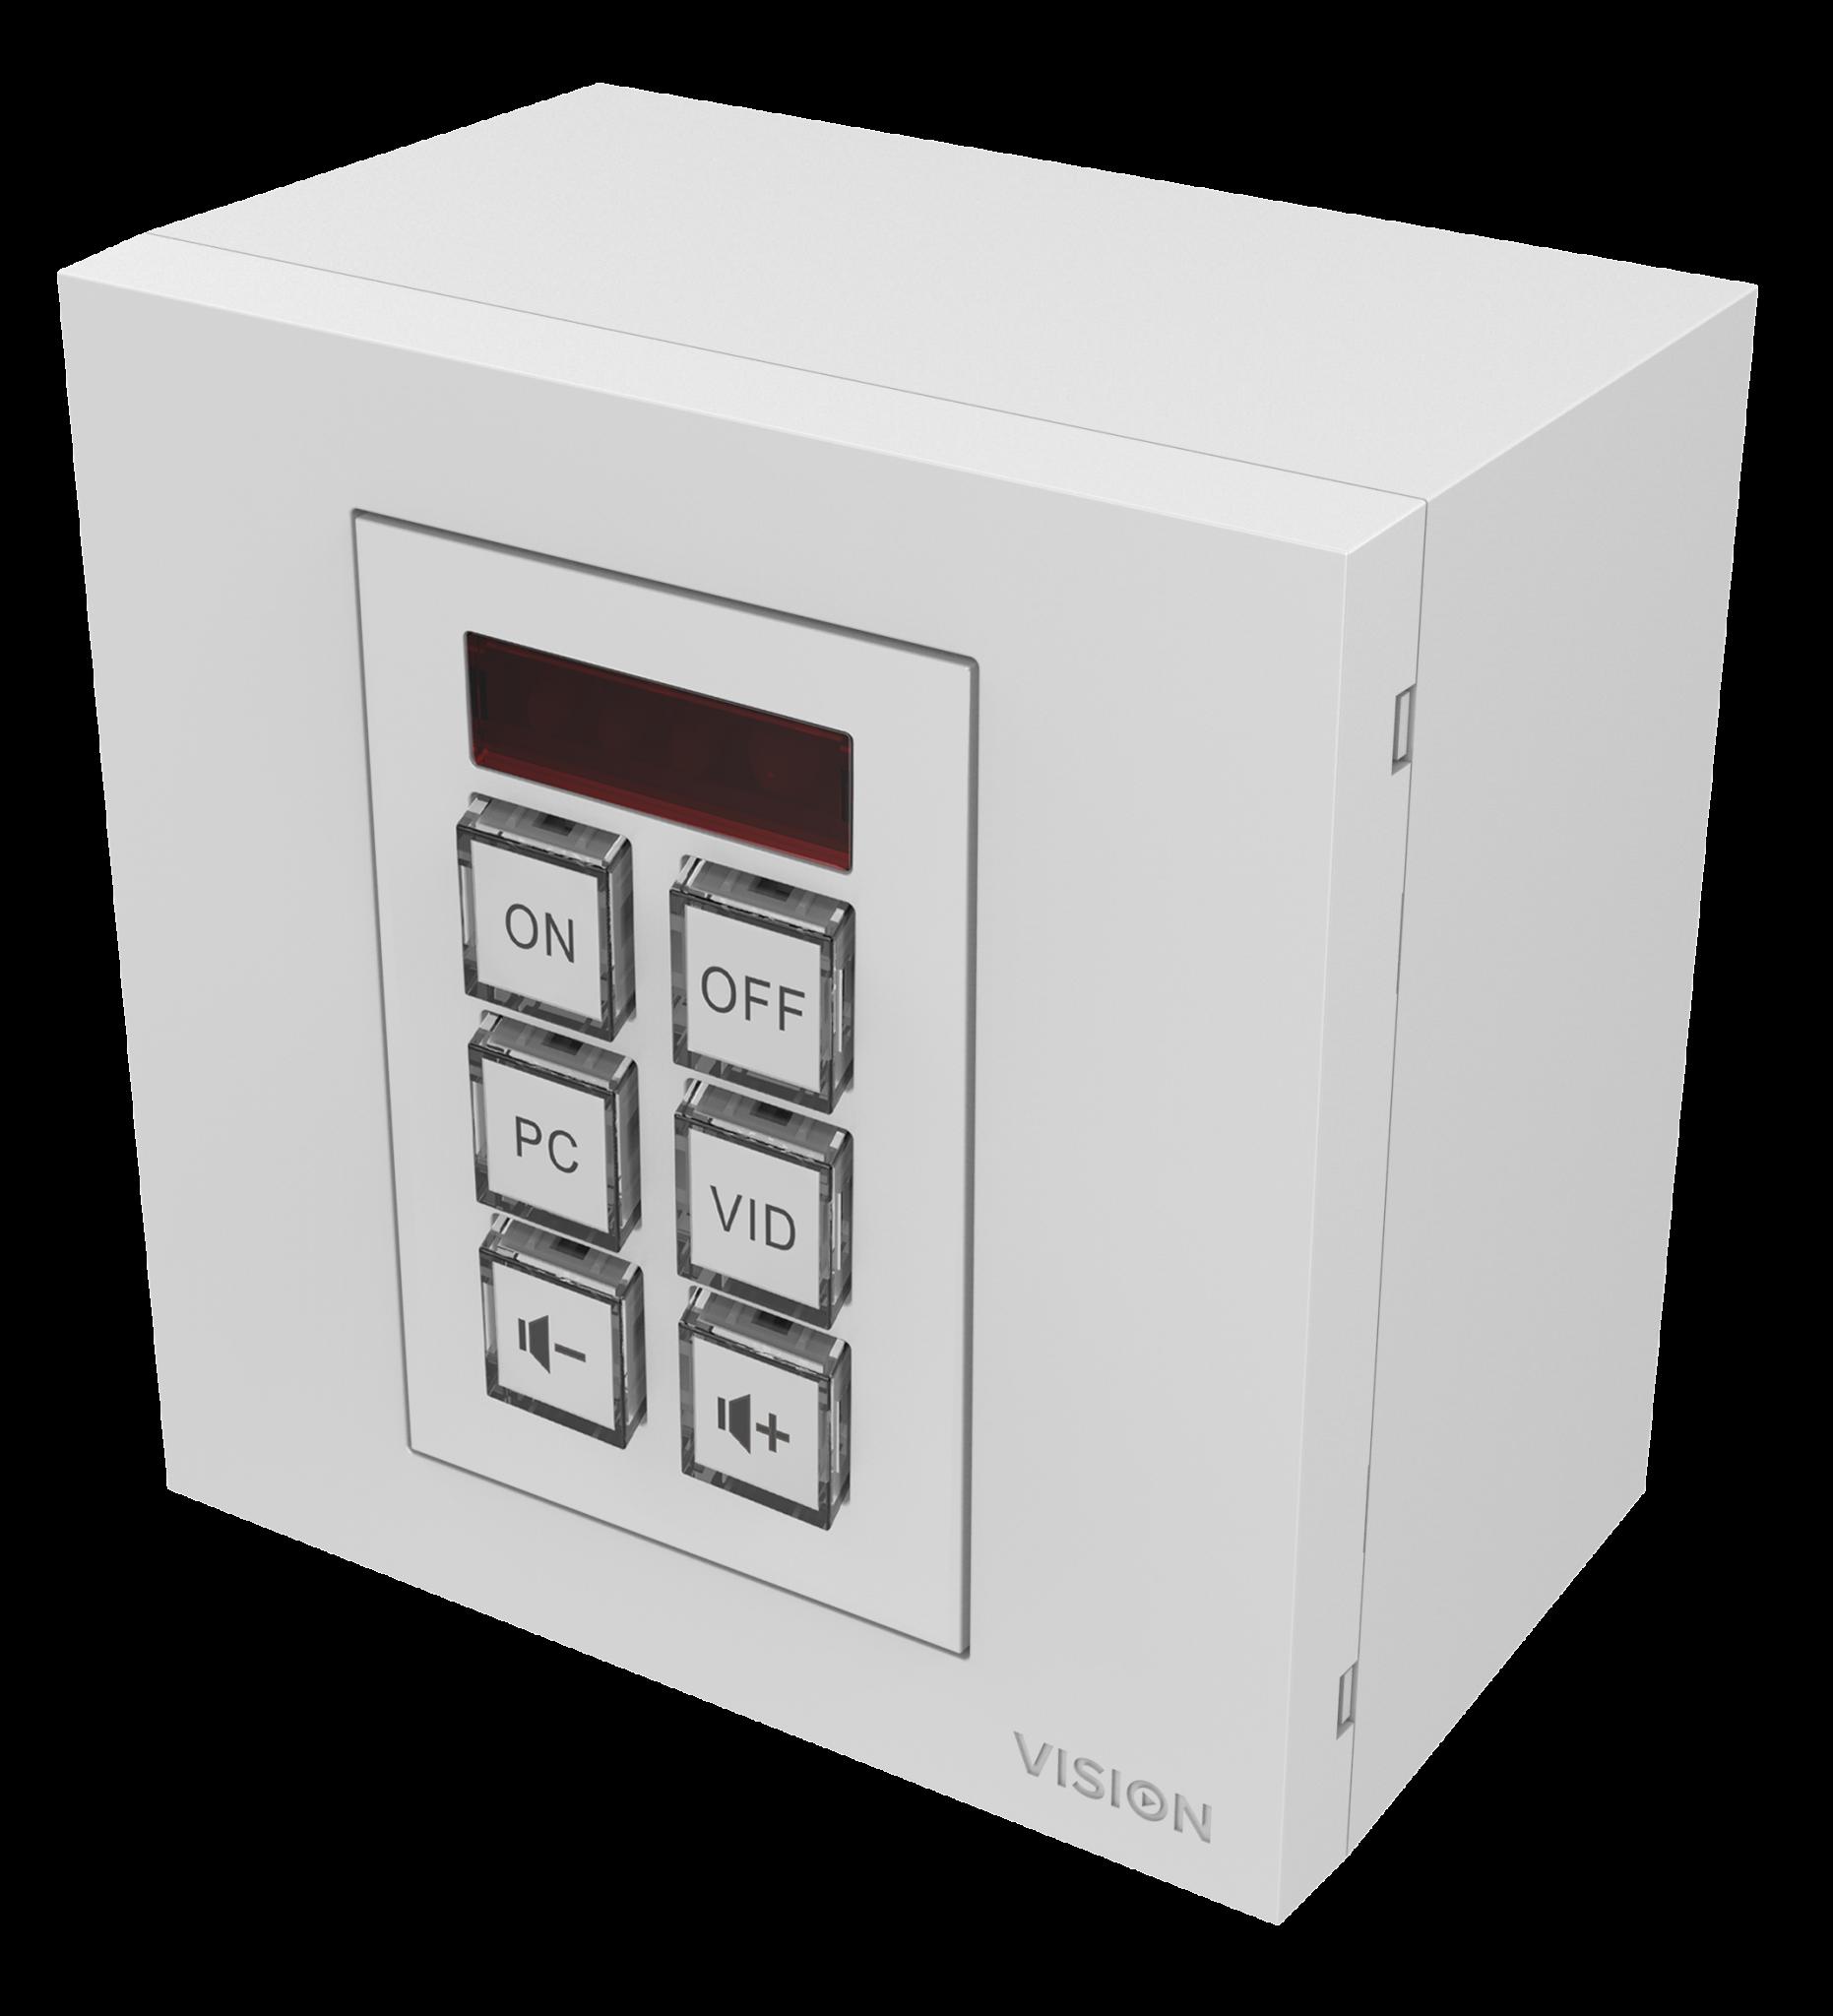 tc3 ctl universal control vision pro av products